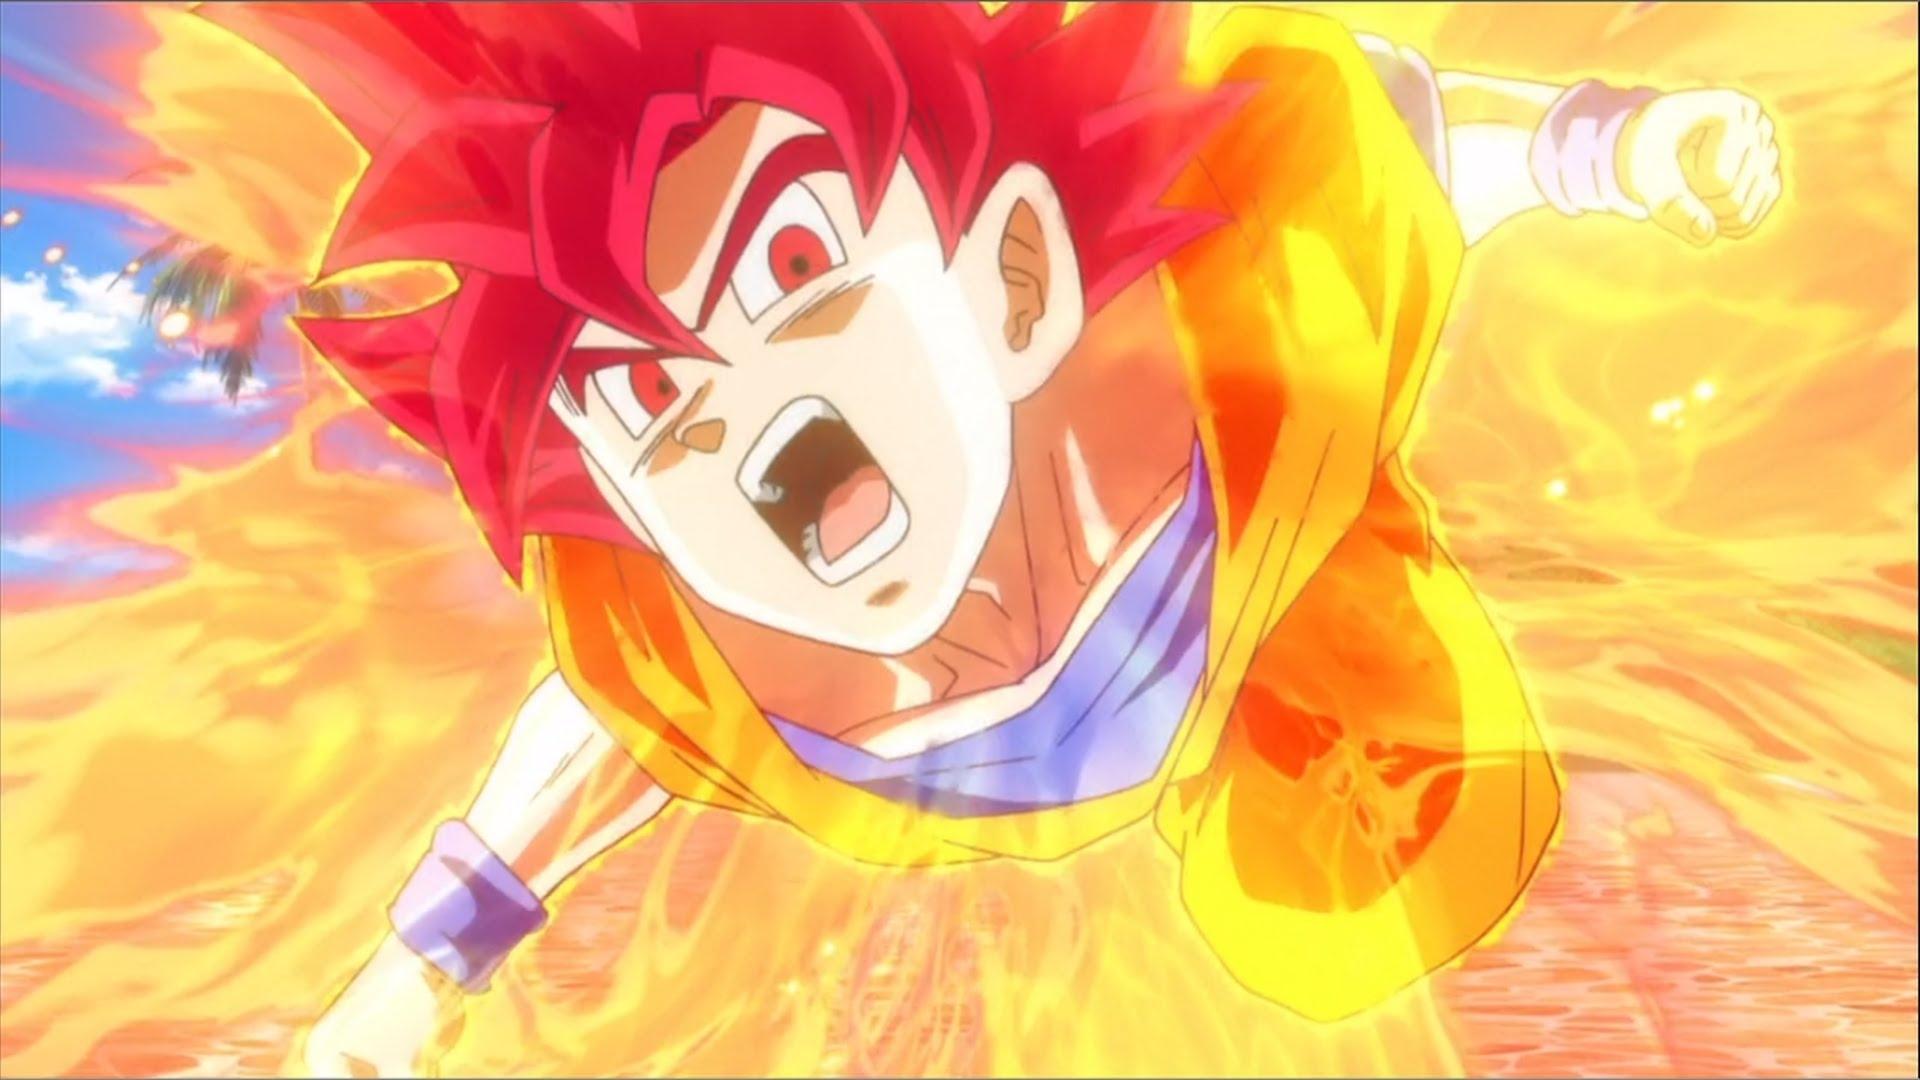 son goku super saiyan god wallpaper | anime | pinterest | goku